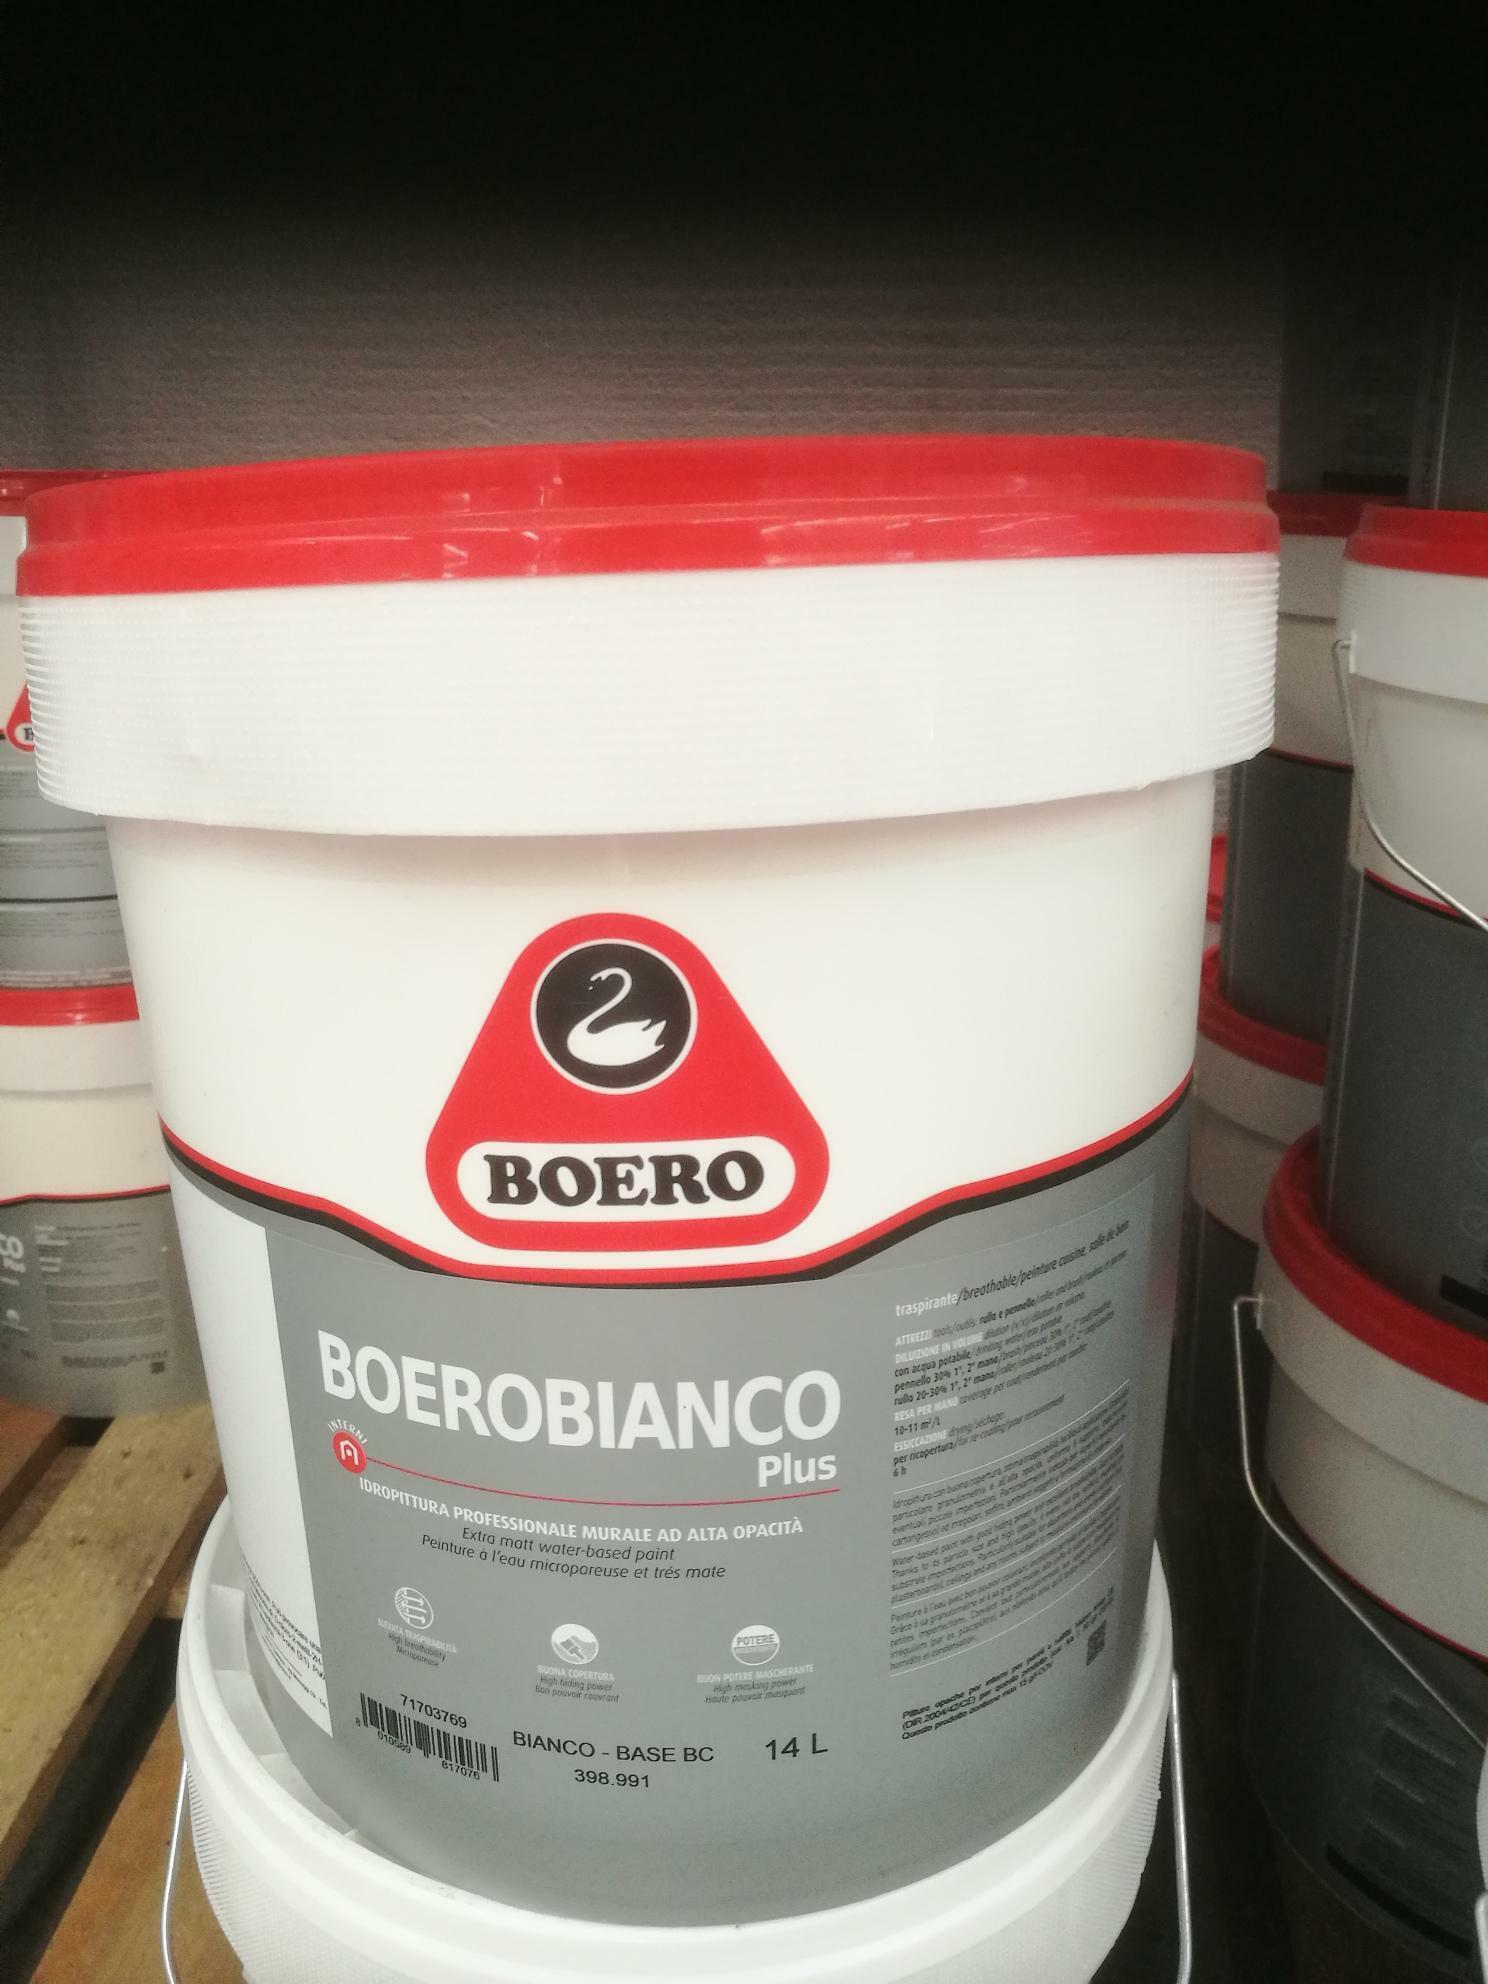 boero boero bianco plus 5 lt idropittura professionale murale ad alta opacita'